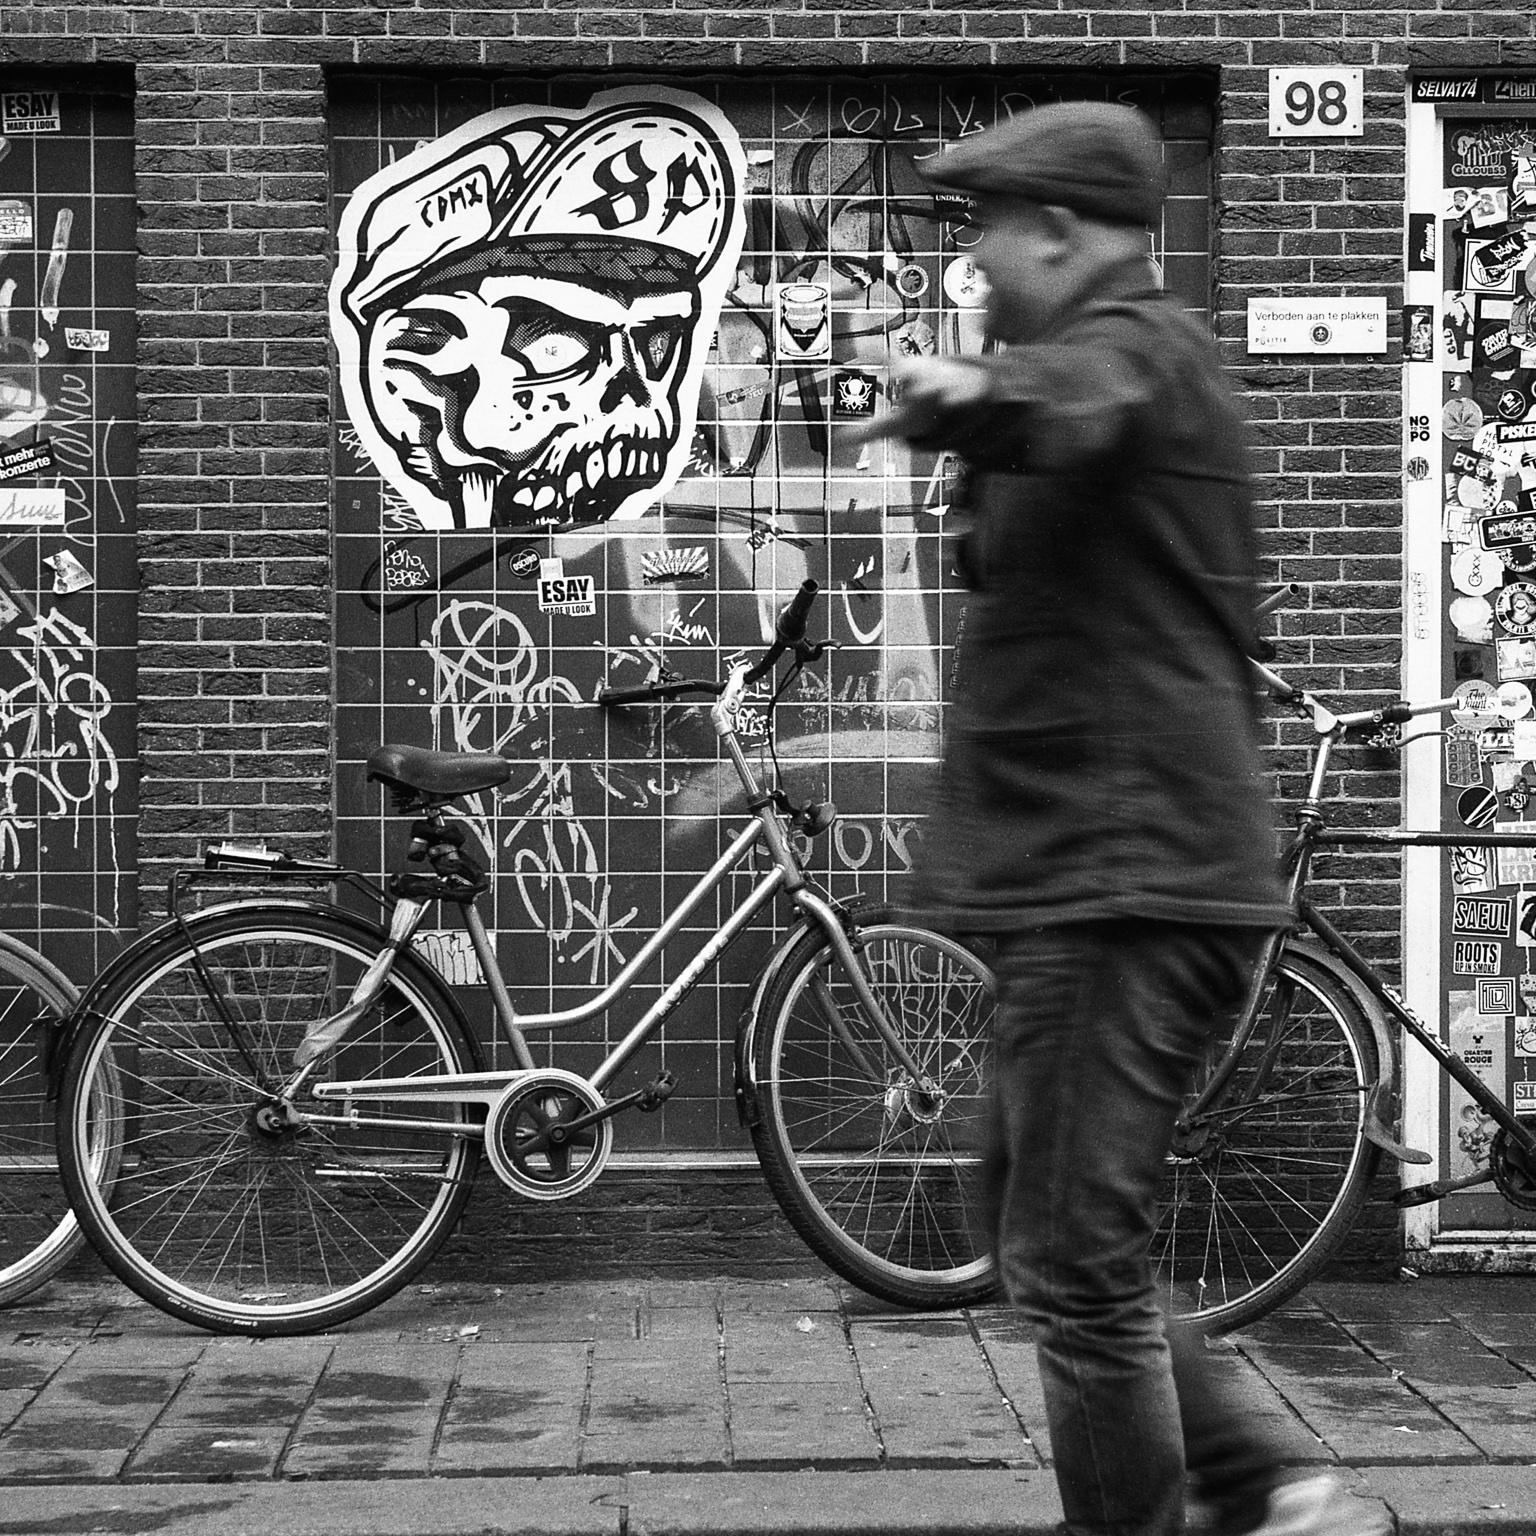 017-Amsterdam.jpg